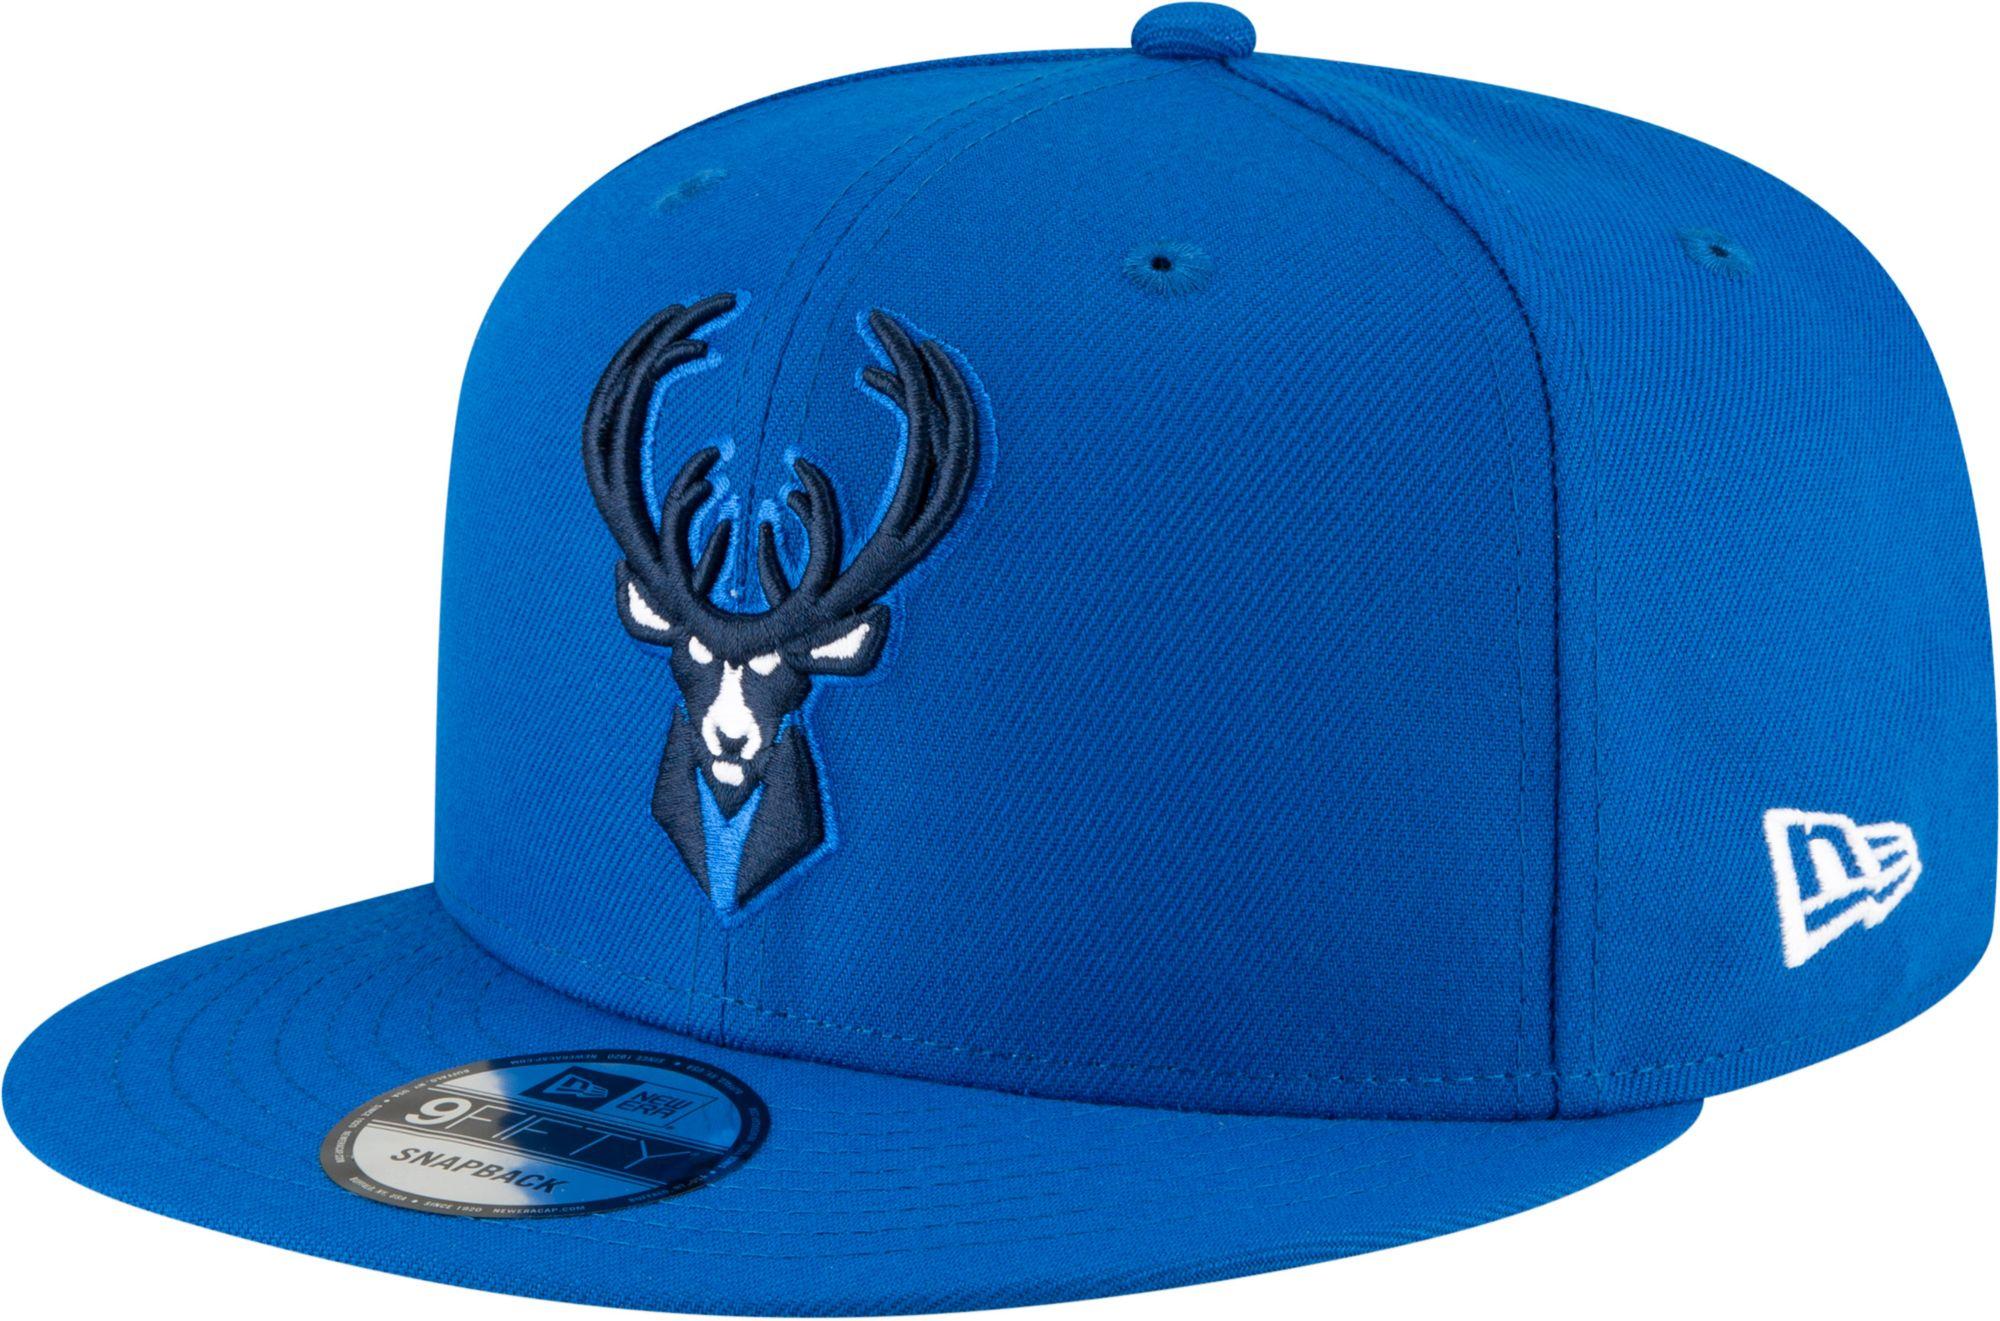 New Era Youth 2020-21 City Edition Milwaukee Bucks 9Fifty Alternate Adjustable Snapback Hat, Men's, Blue thumbnail